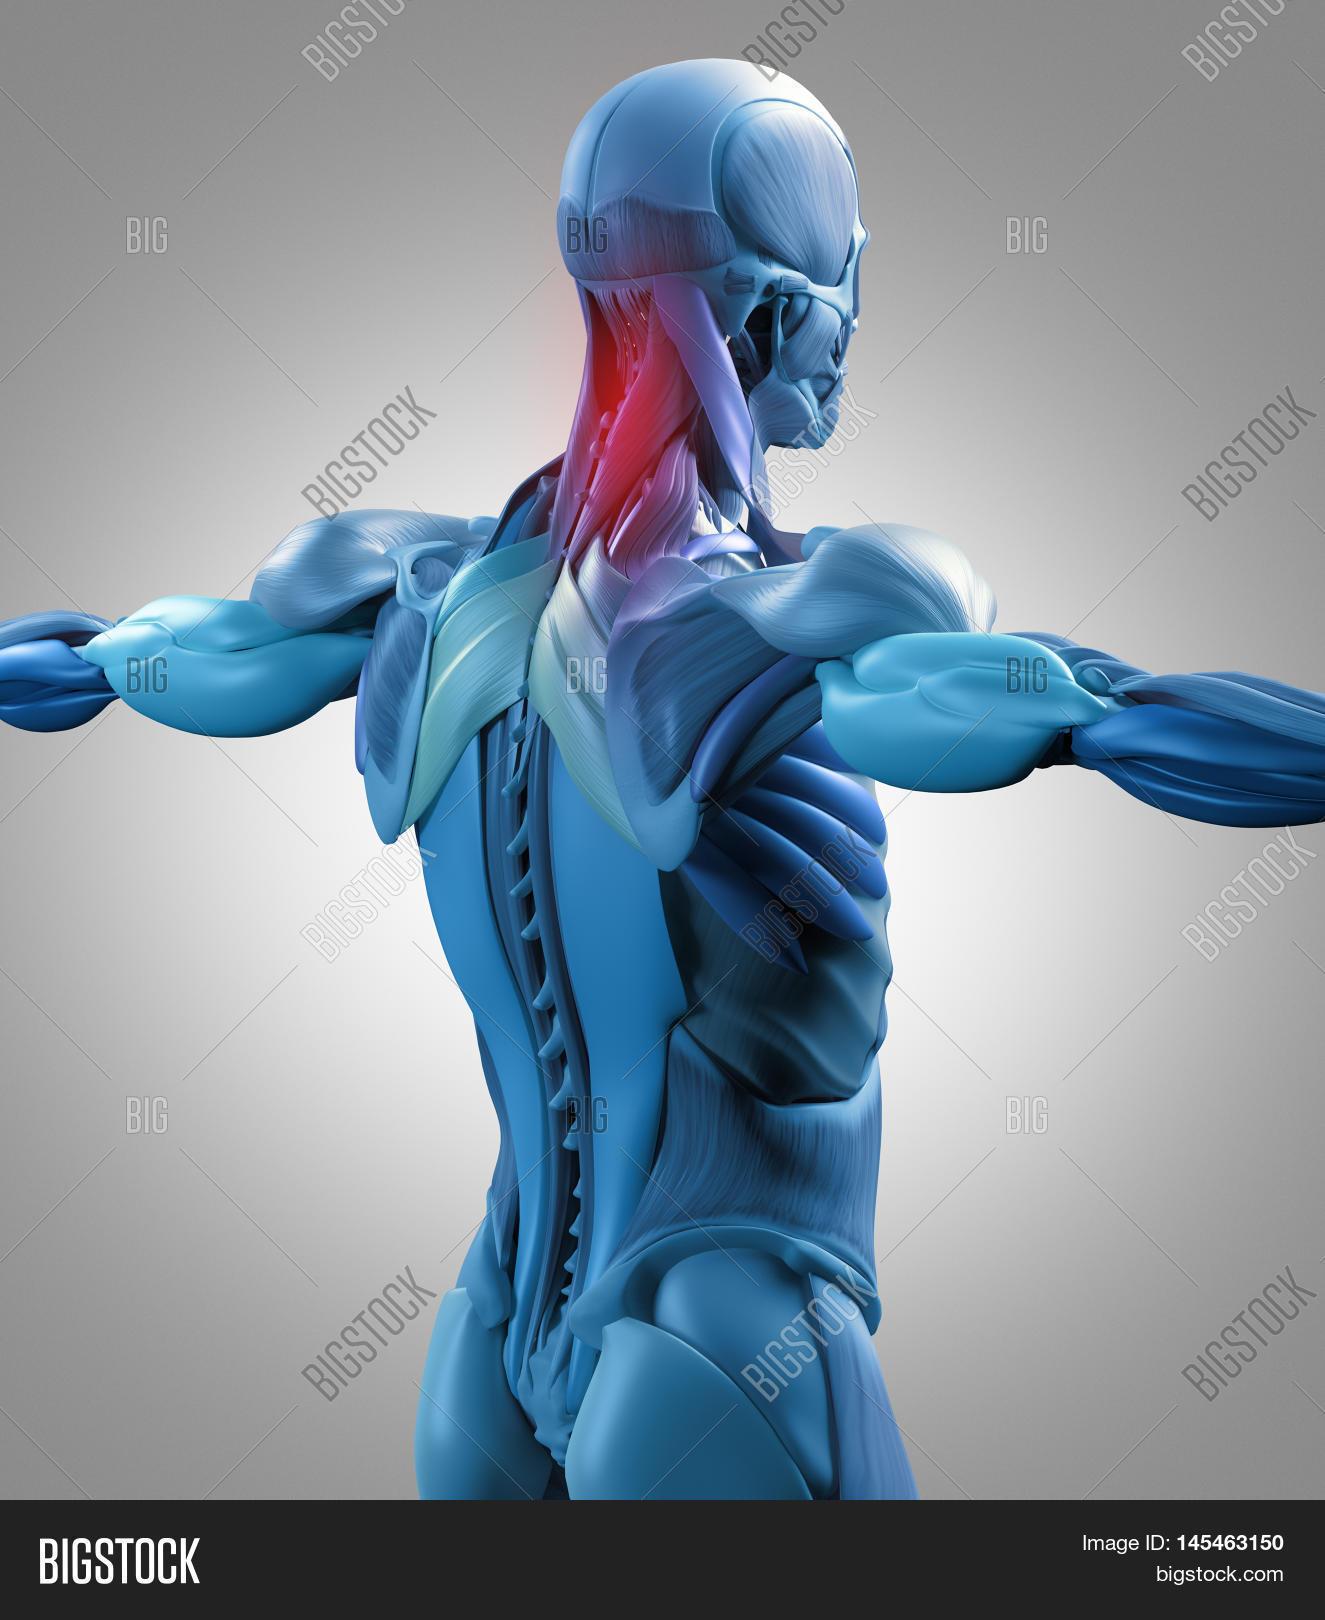 Human Anatomy Muscle Image Photo Free Trial Bigstock